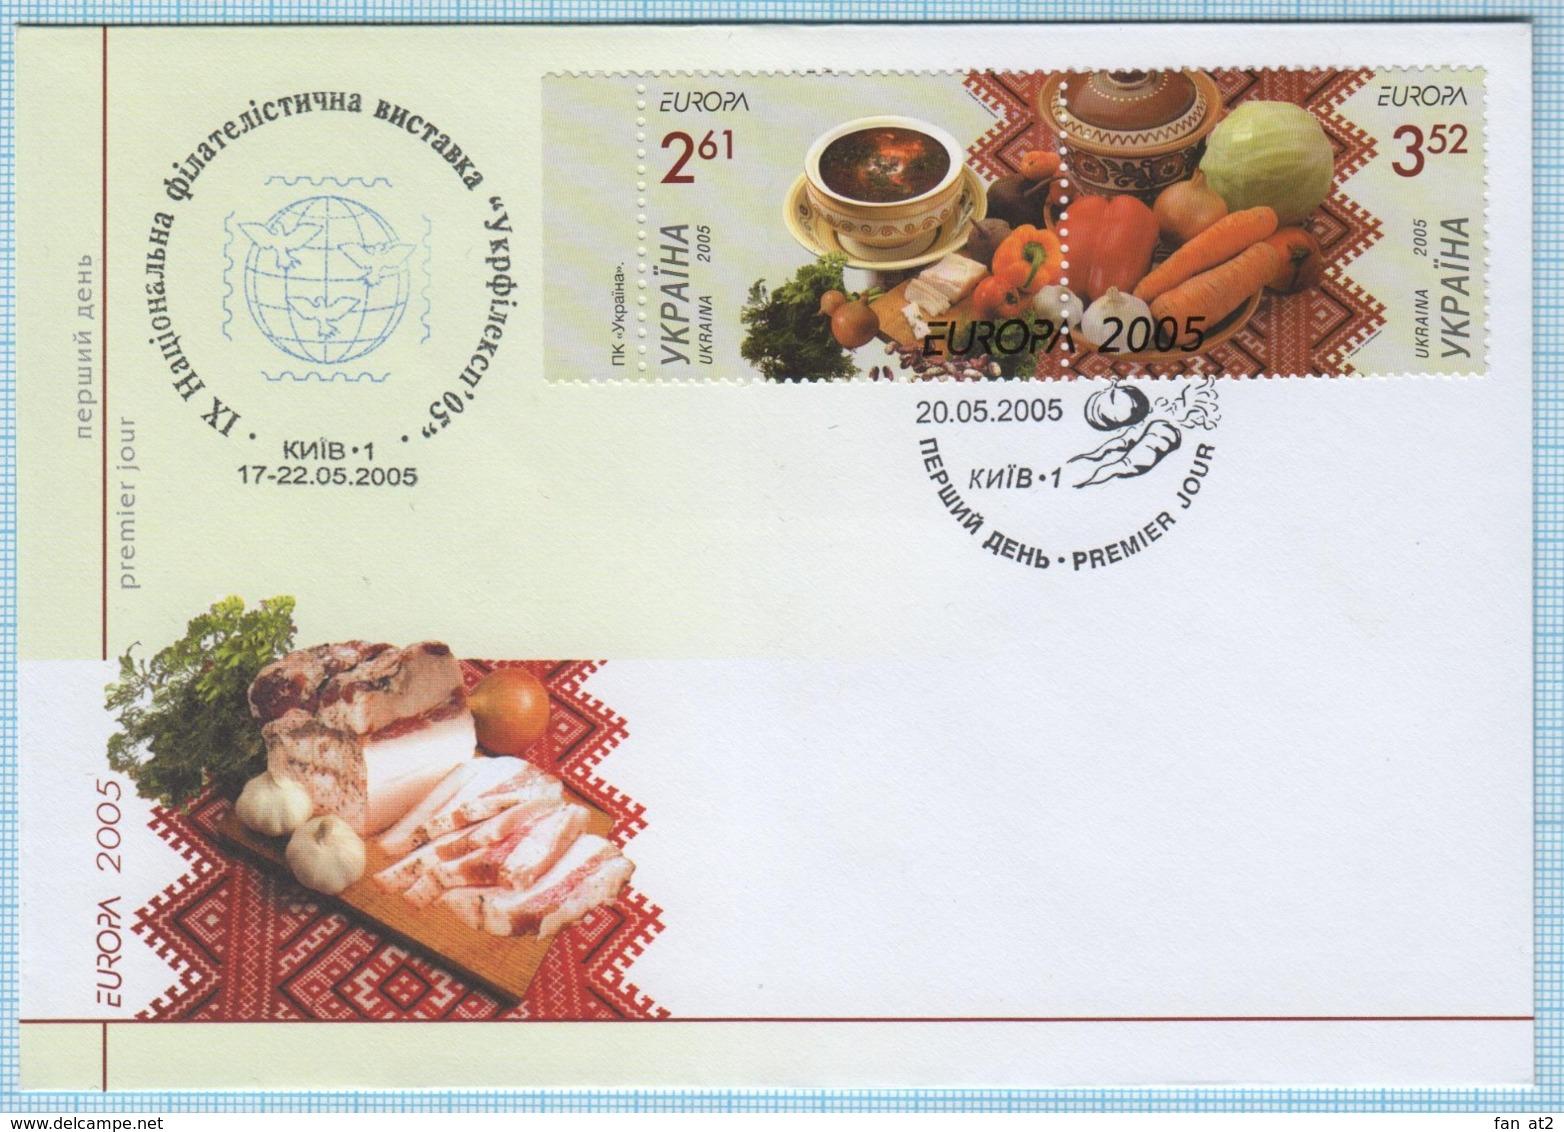 UKRAINE / FDC / Ukrainian Food. Borsch, Fat, Vegetables. EUROPA - CEPT. Кyiv 2005. - Europa-CEPT